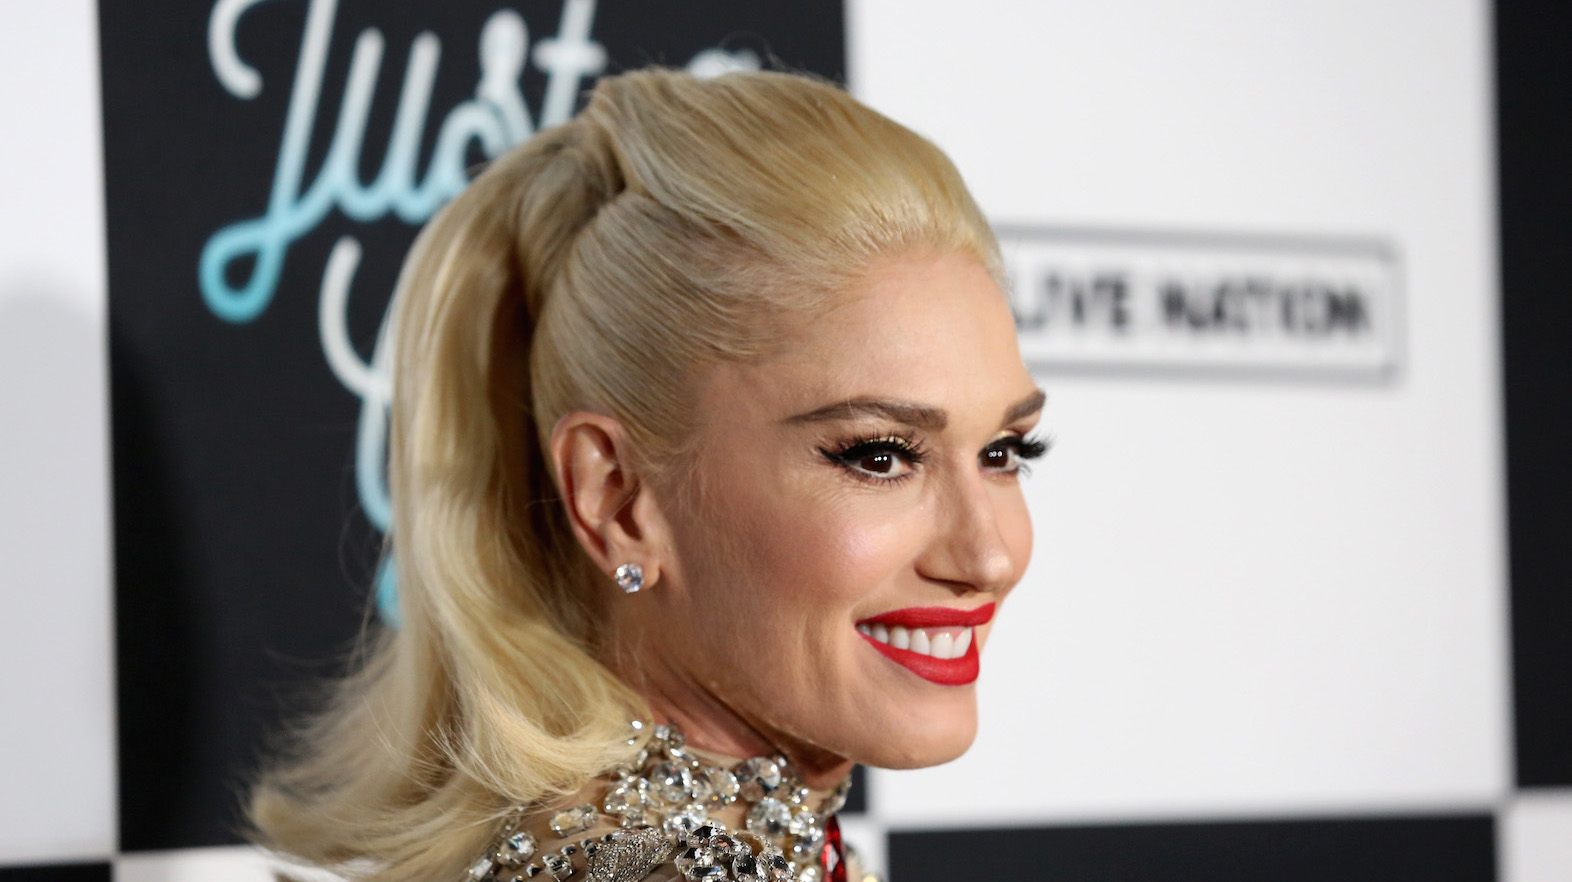 Gwen Stefani Reveals Her Biggest Makeup Tips and Secrets